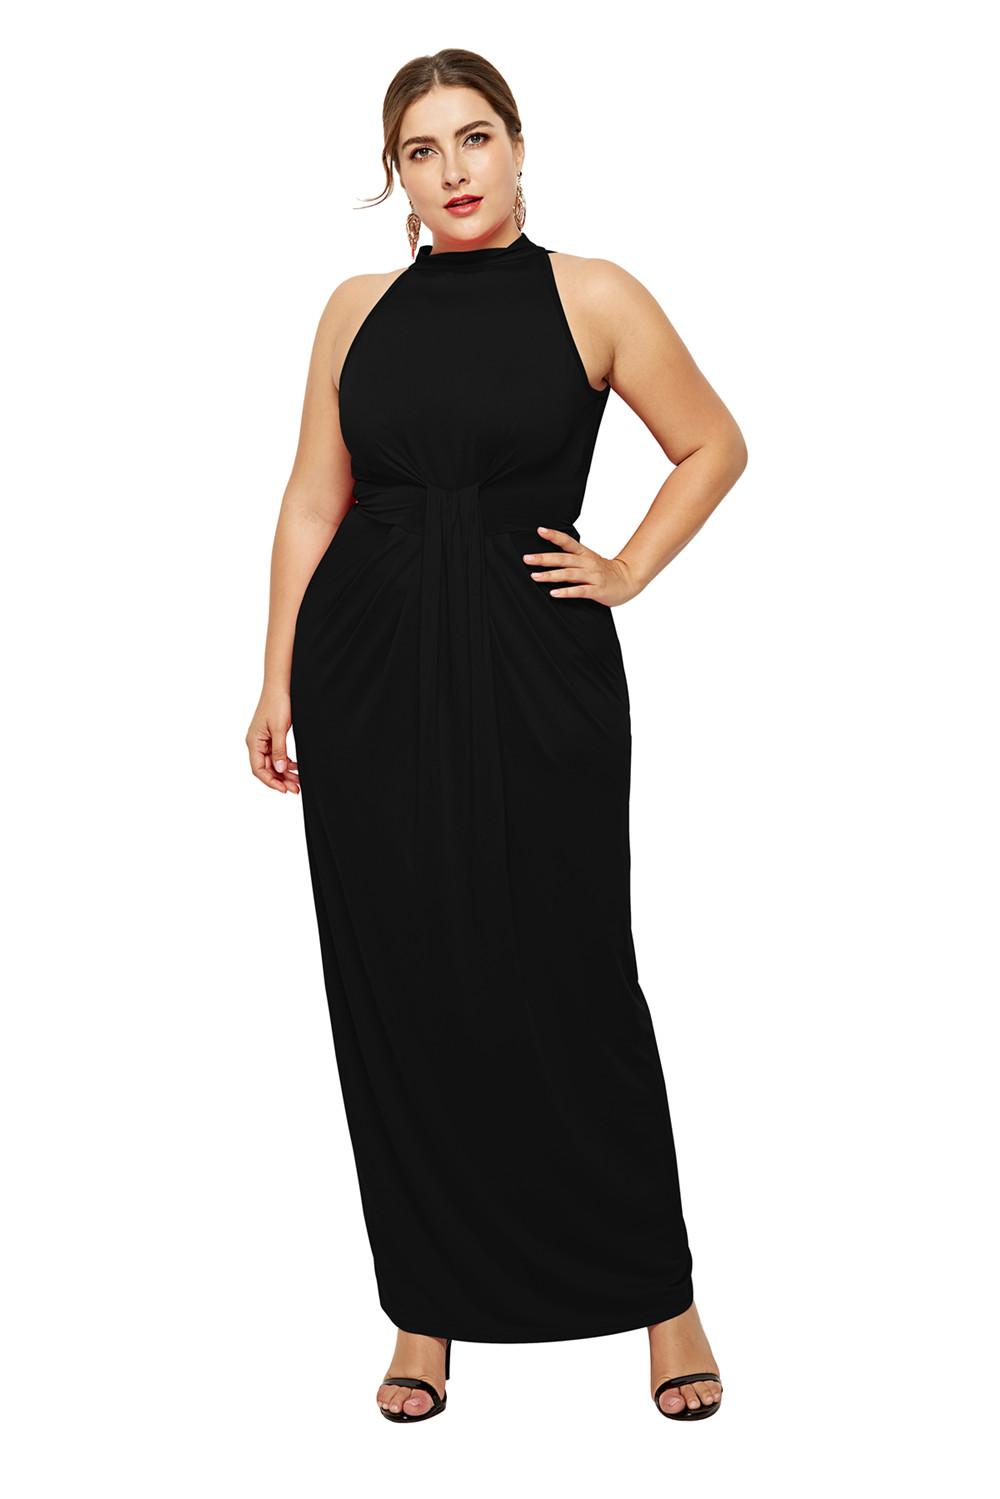 Kleid Große Größen Für Mollige Hochgeschlossen Ärmellos Lang Dunkelblau  Jersey Falten